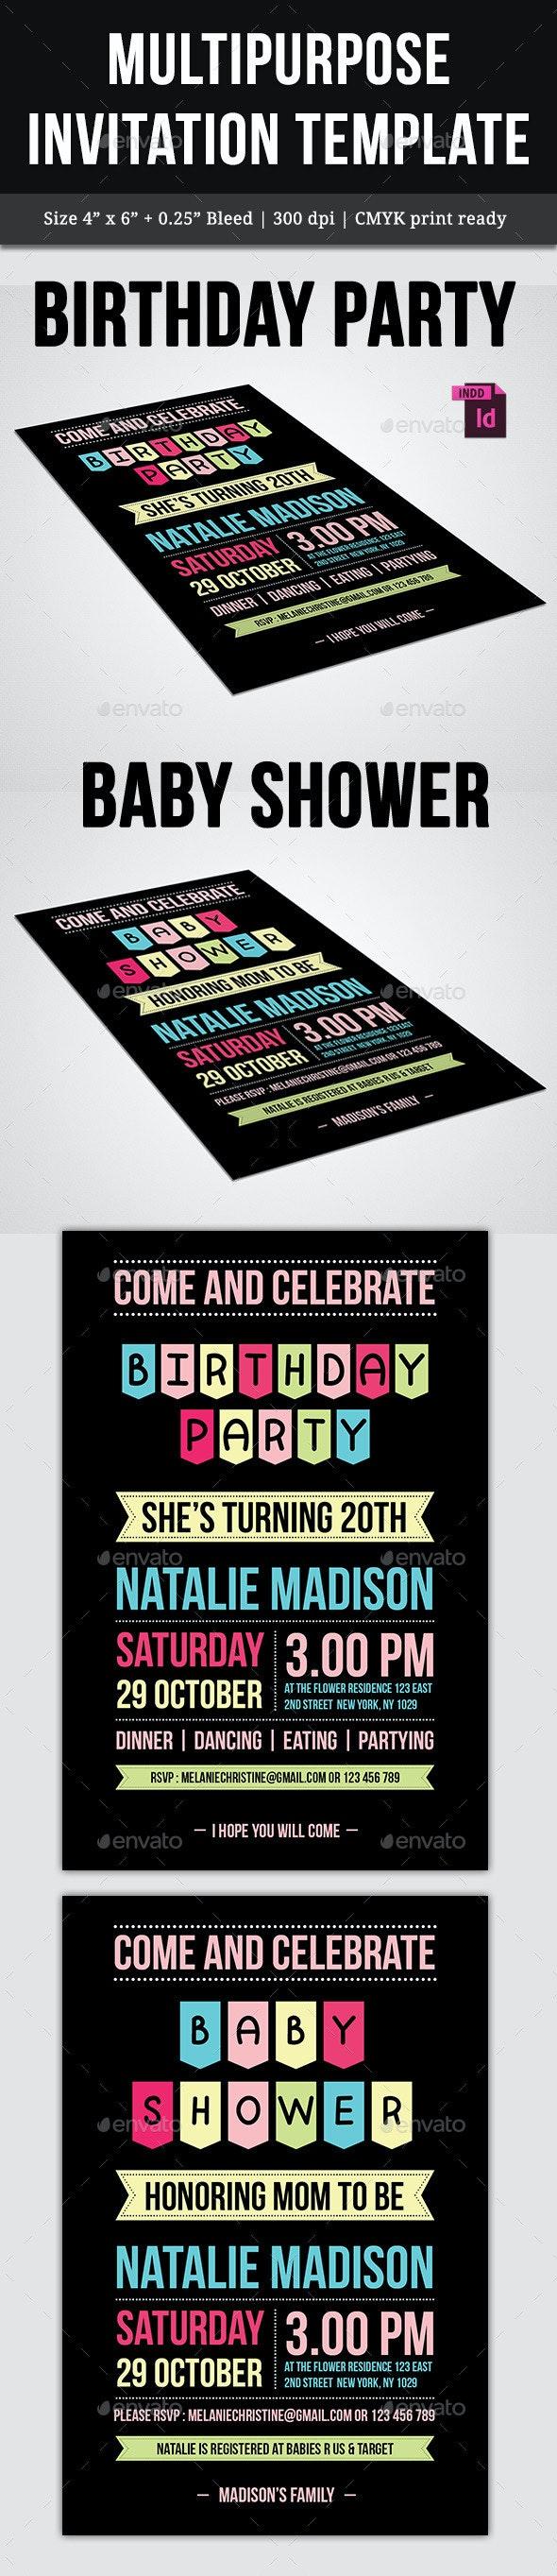 Multipurpose Invitation Template - Cards & Invites Print Templates